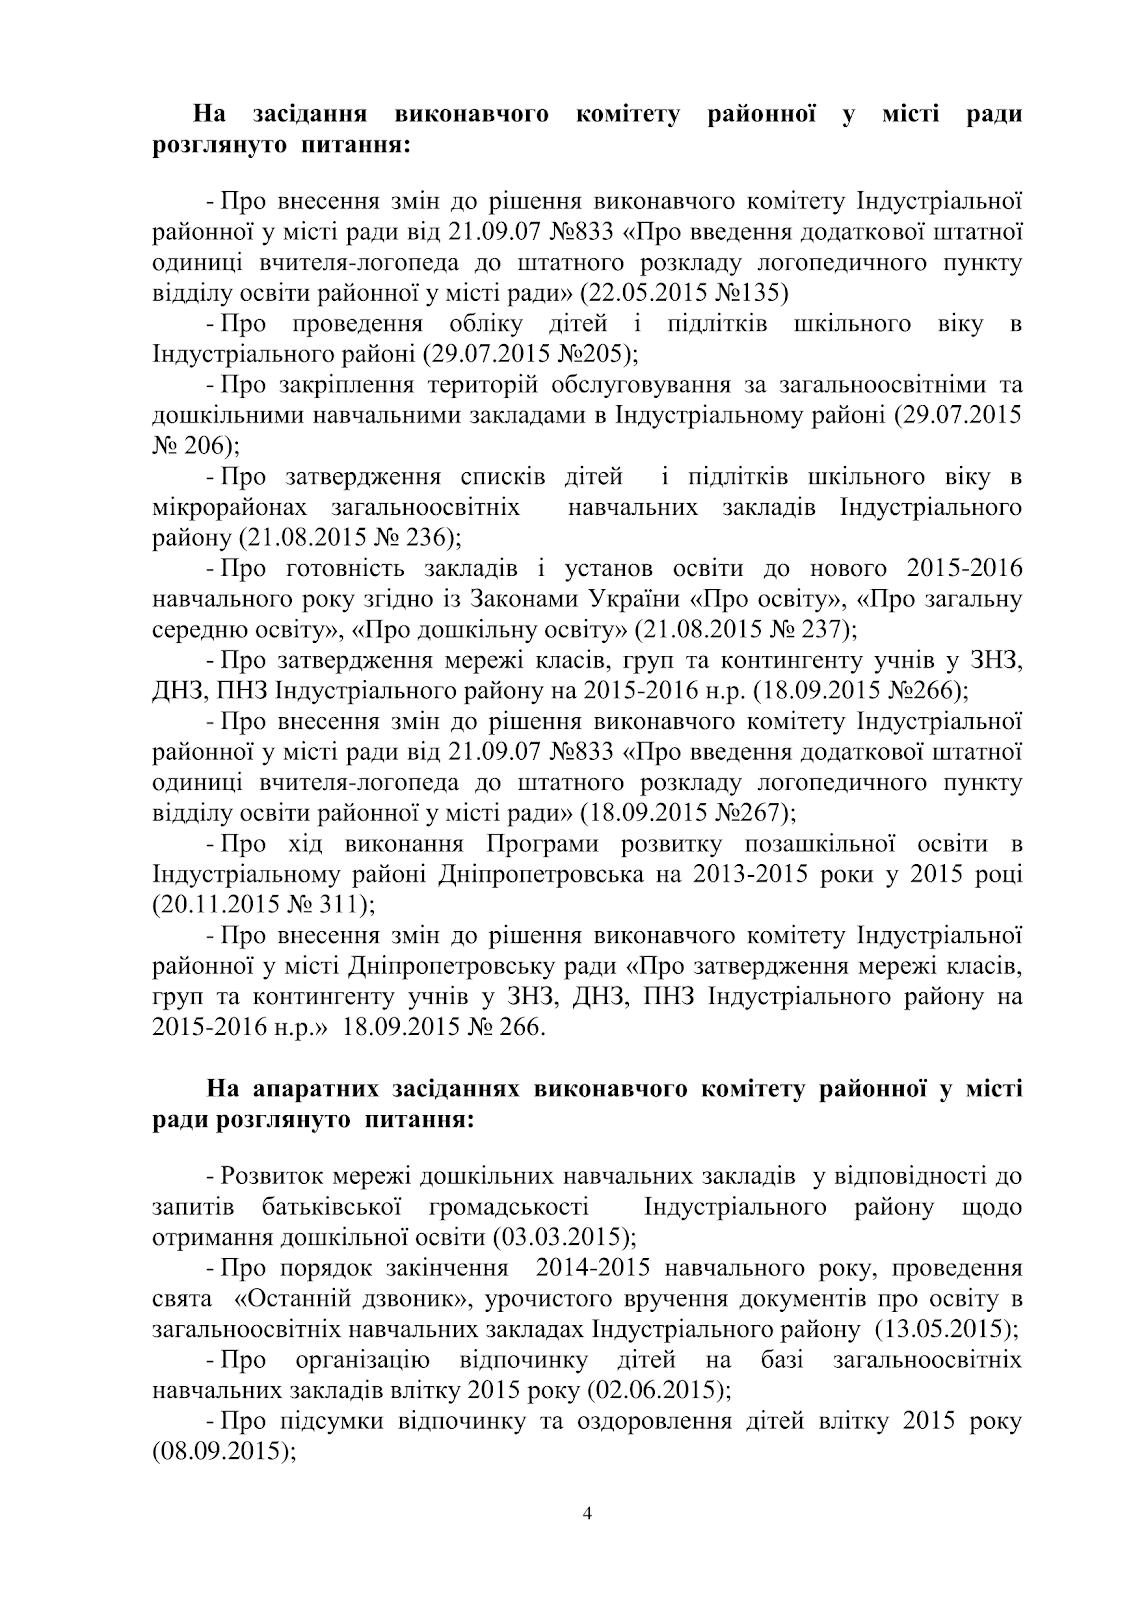 C:\Users\Валерия\Desktop\план 2016 рік\план 2016 рік-004.png